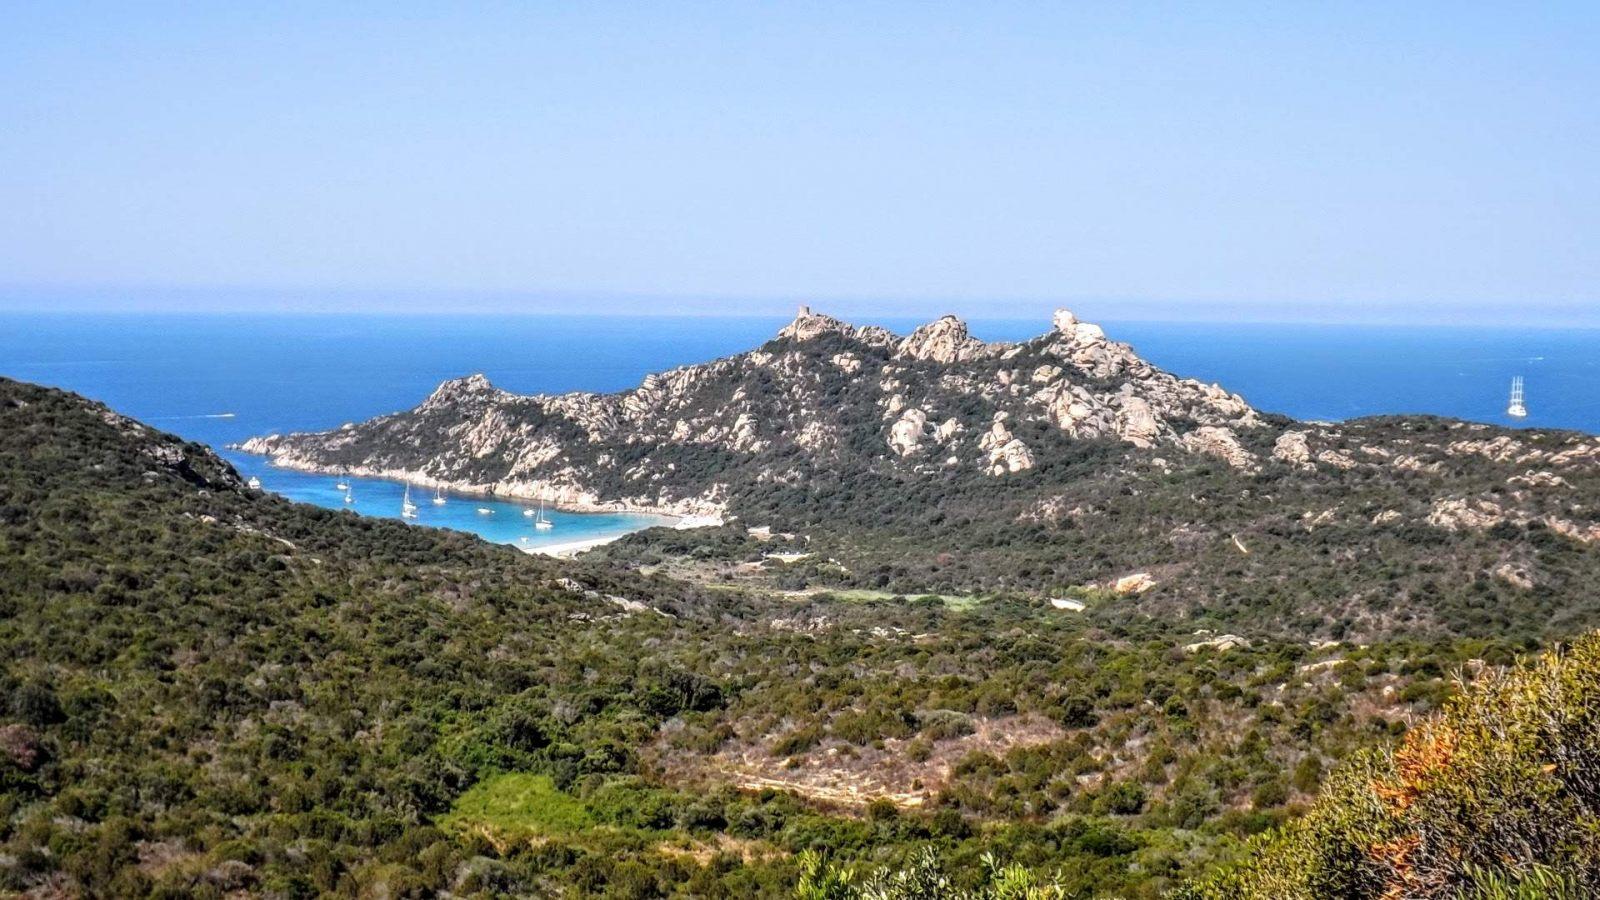 Hibiscus & Nomada : - - Roccapina Viewpoint